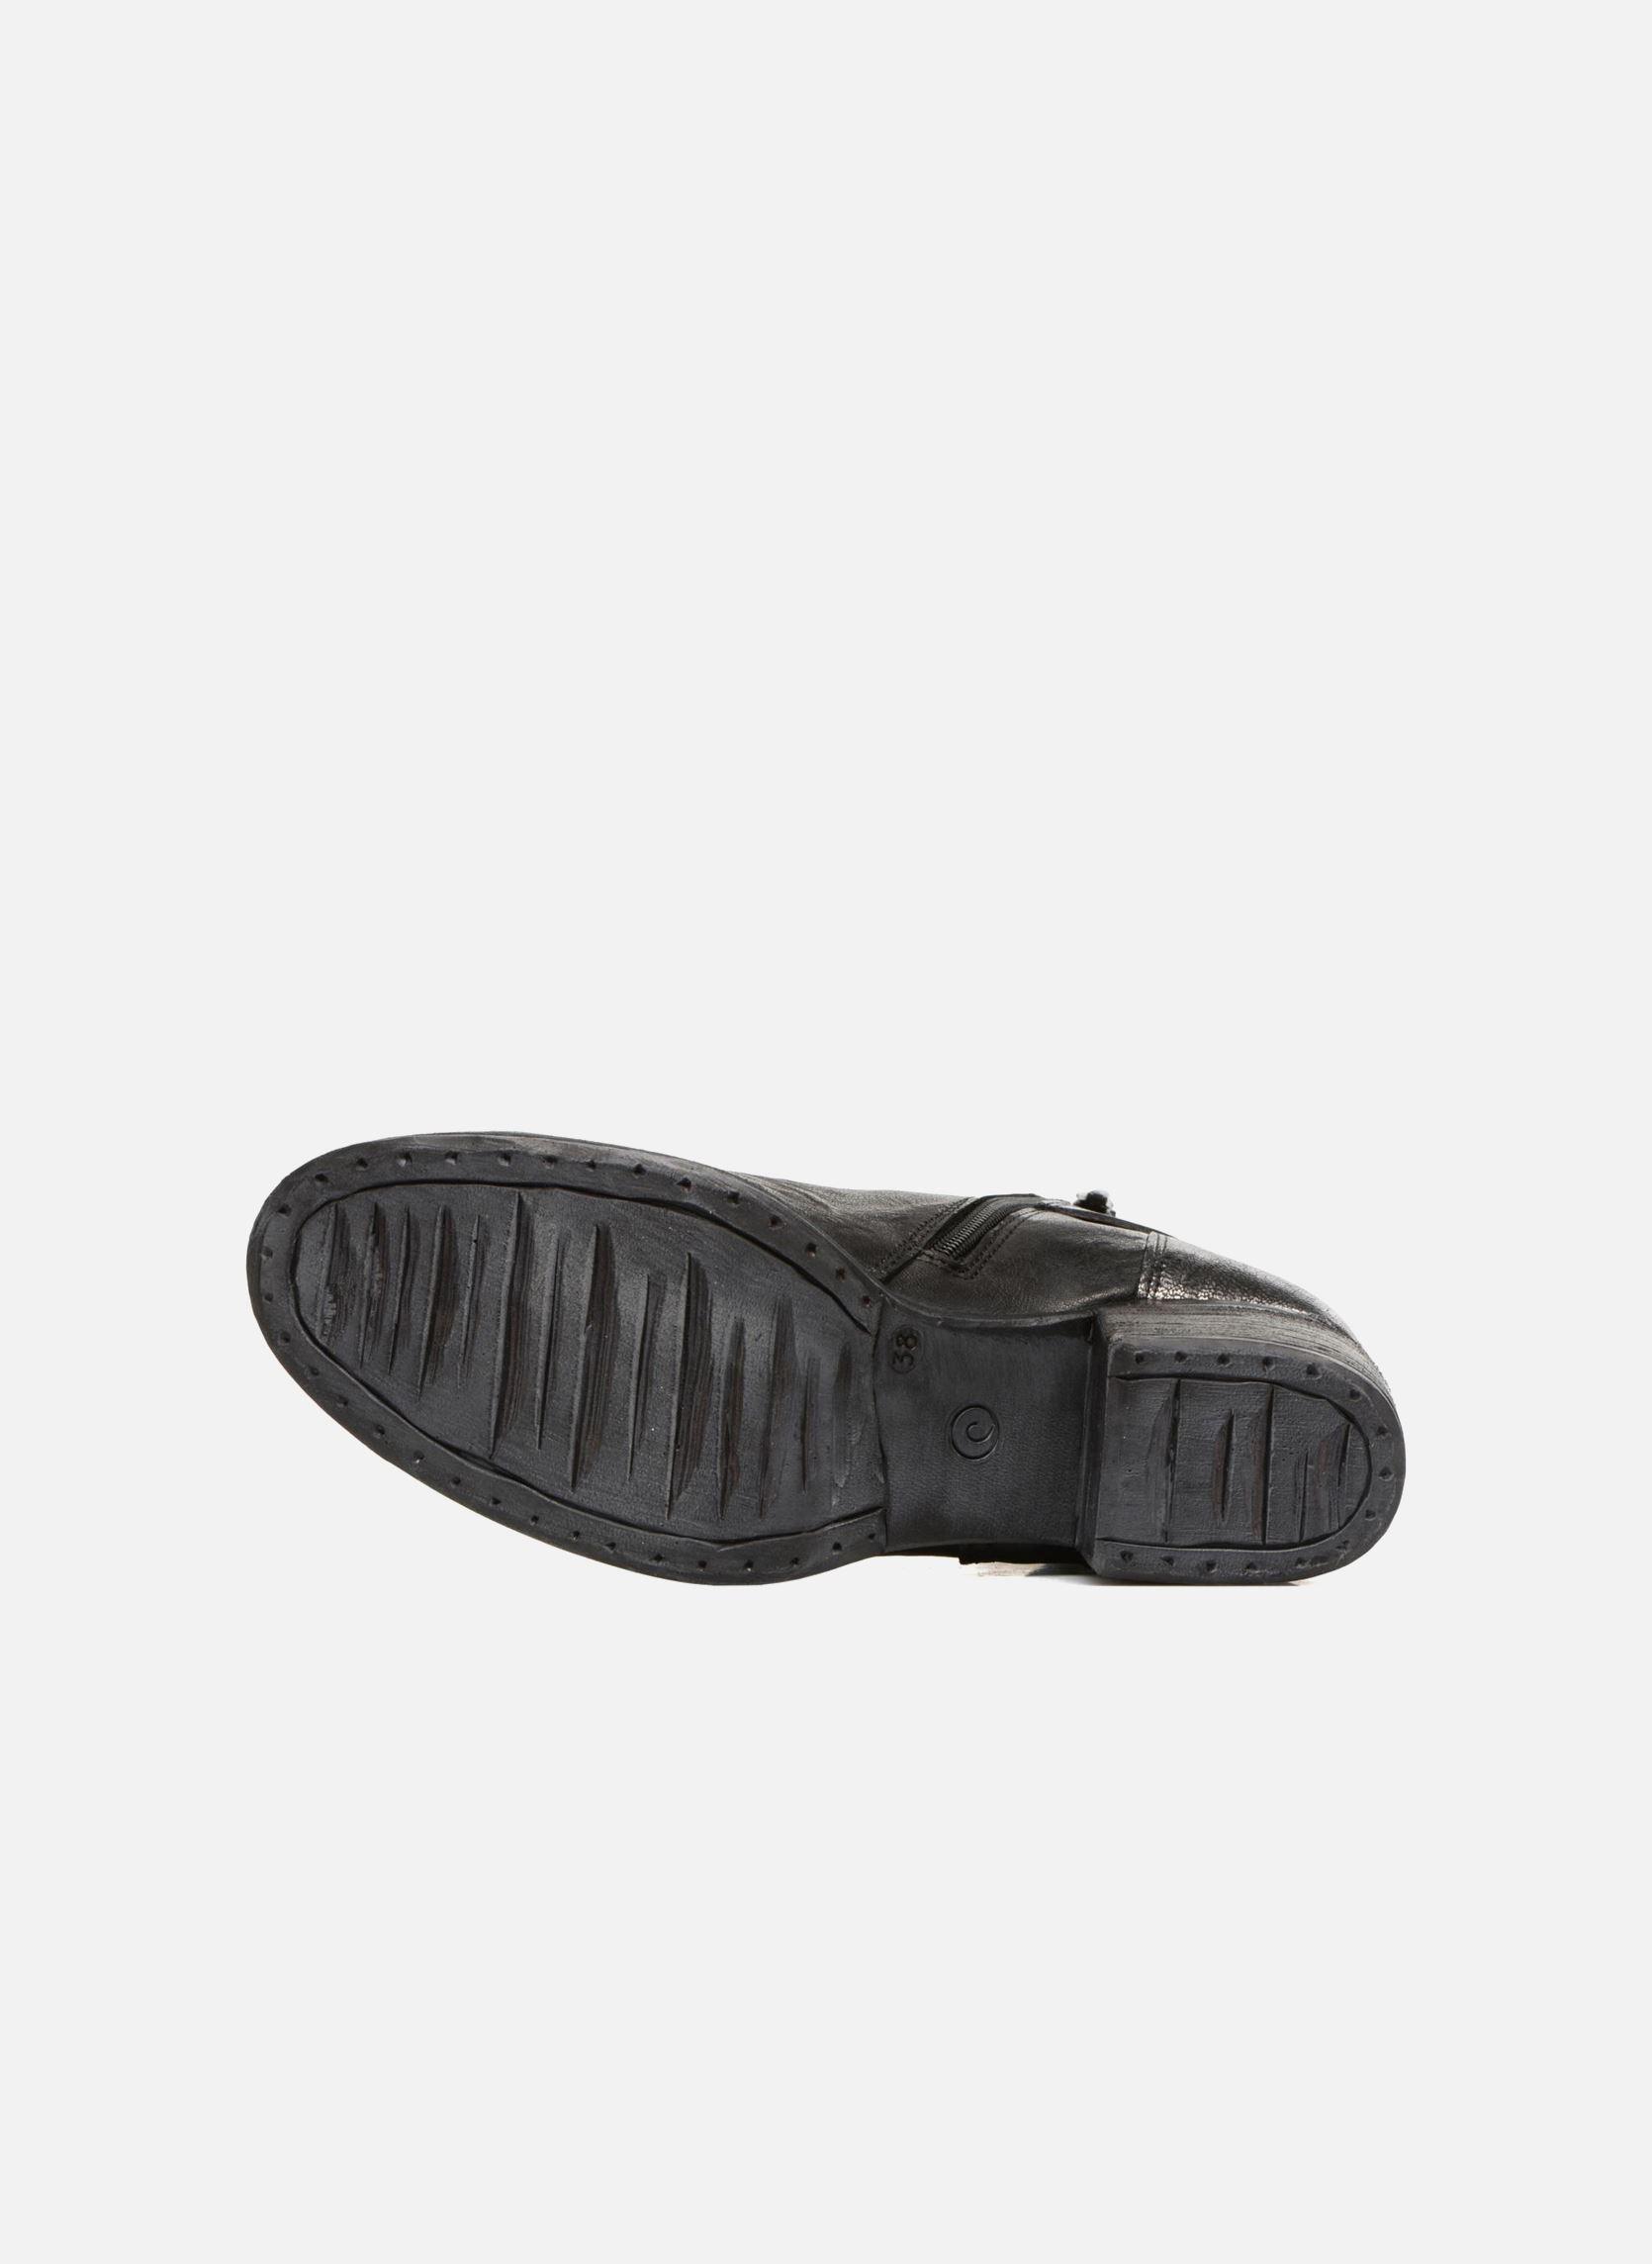 boots Noir Khrio et et Bottines Bottines Valema Khrio PlZukwOTXi